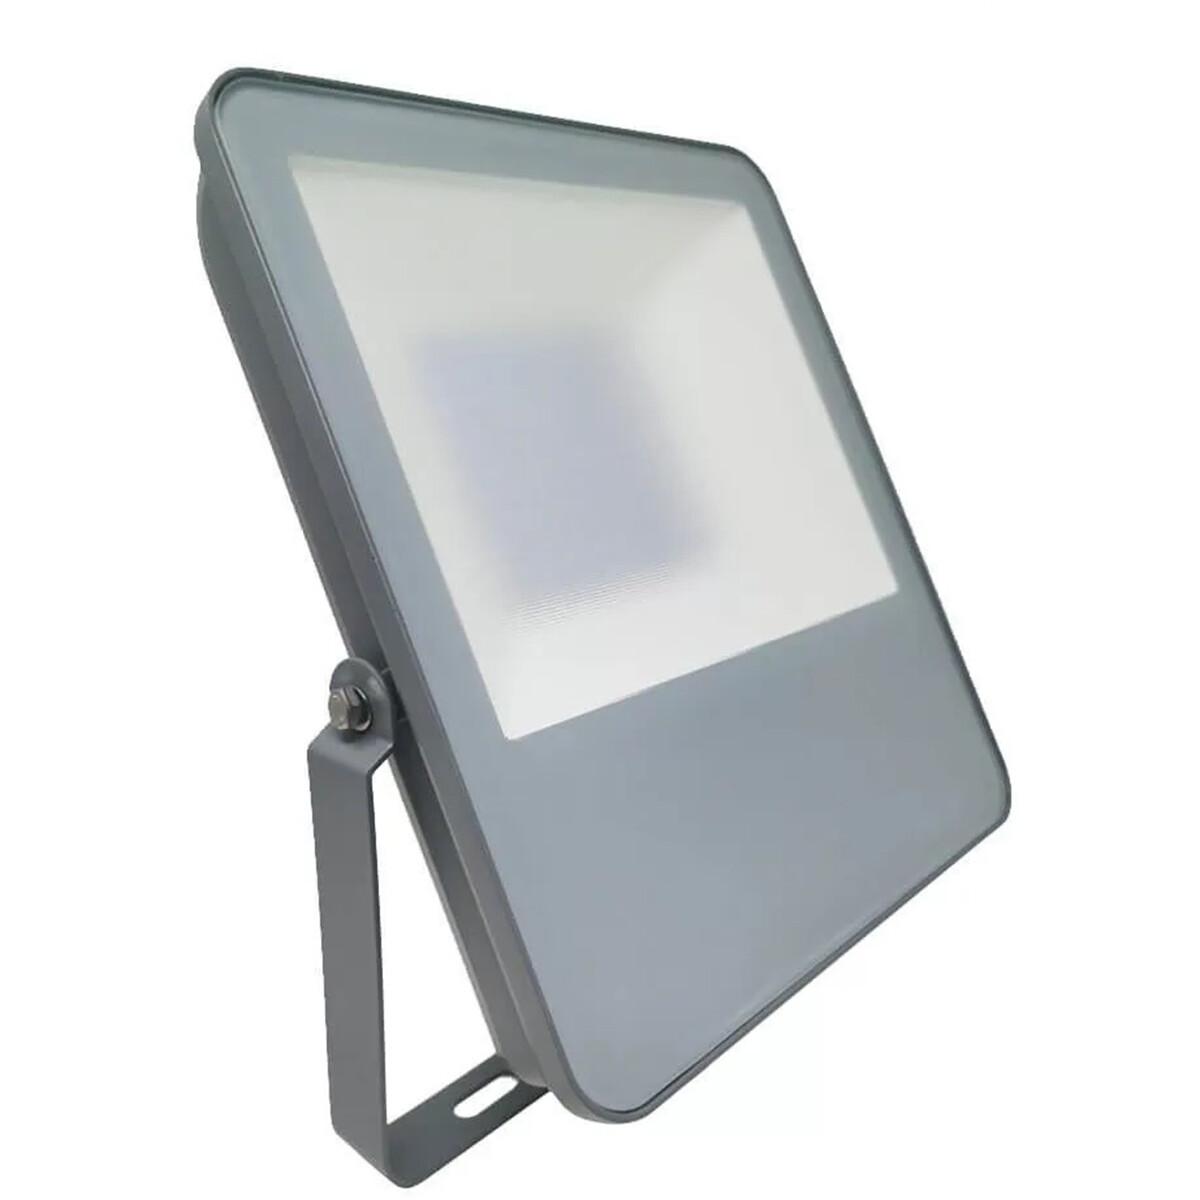 OSRAM - LED Bouwlamp - Facto Evola - 50 Watt - LED Schijnwerper - Warm Wit 3000K - Waterdicht IP65 -